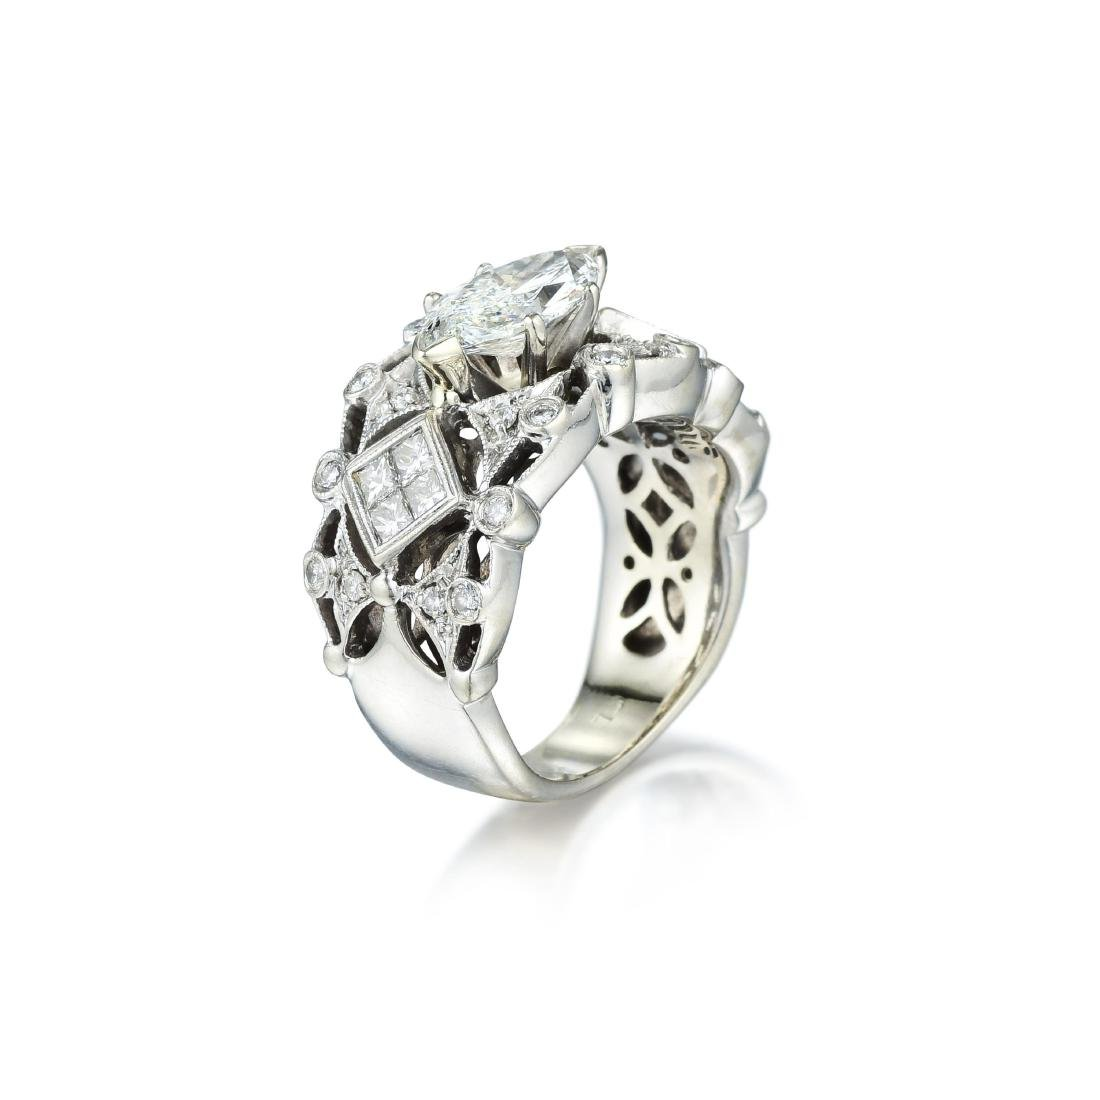 A 1.23-Carat Marquise-Cut Diamond Band - 2